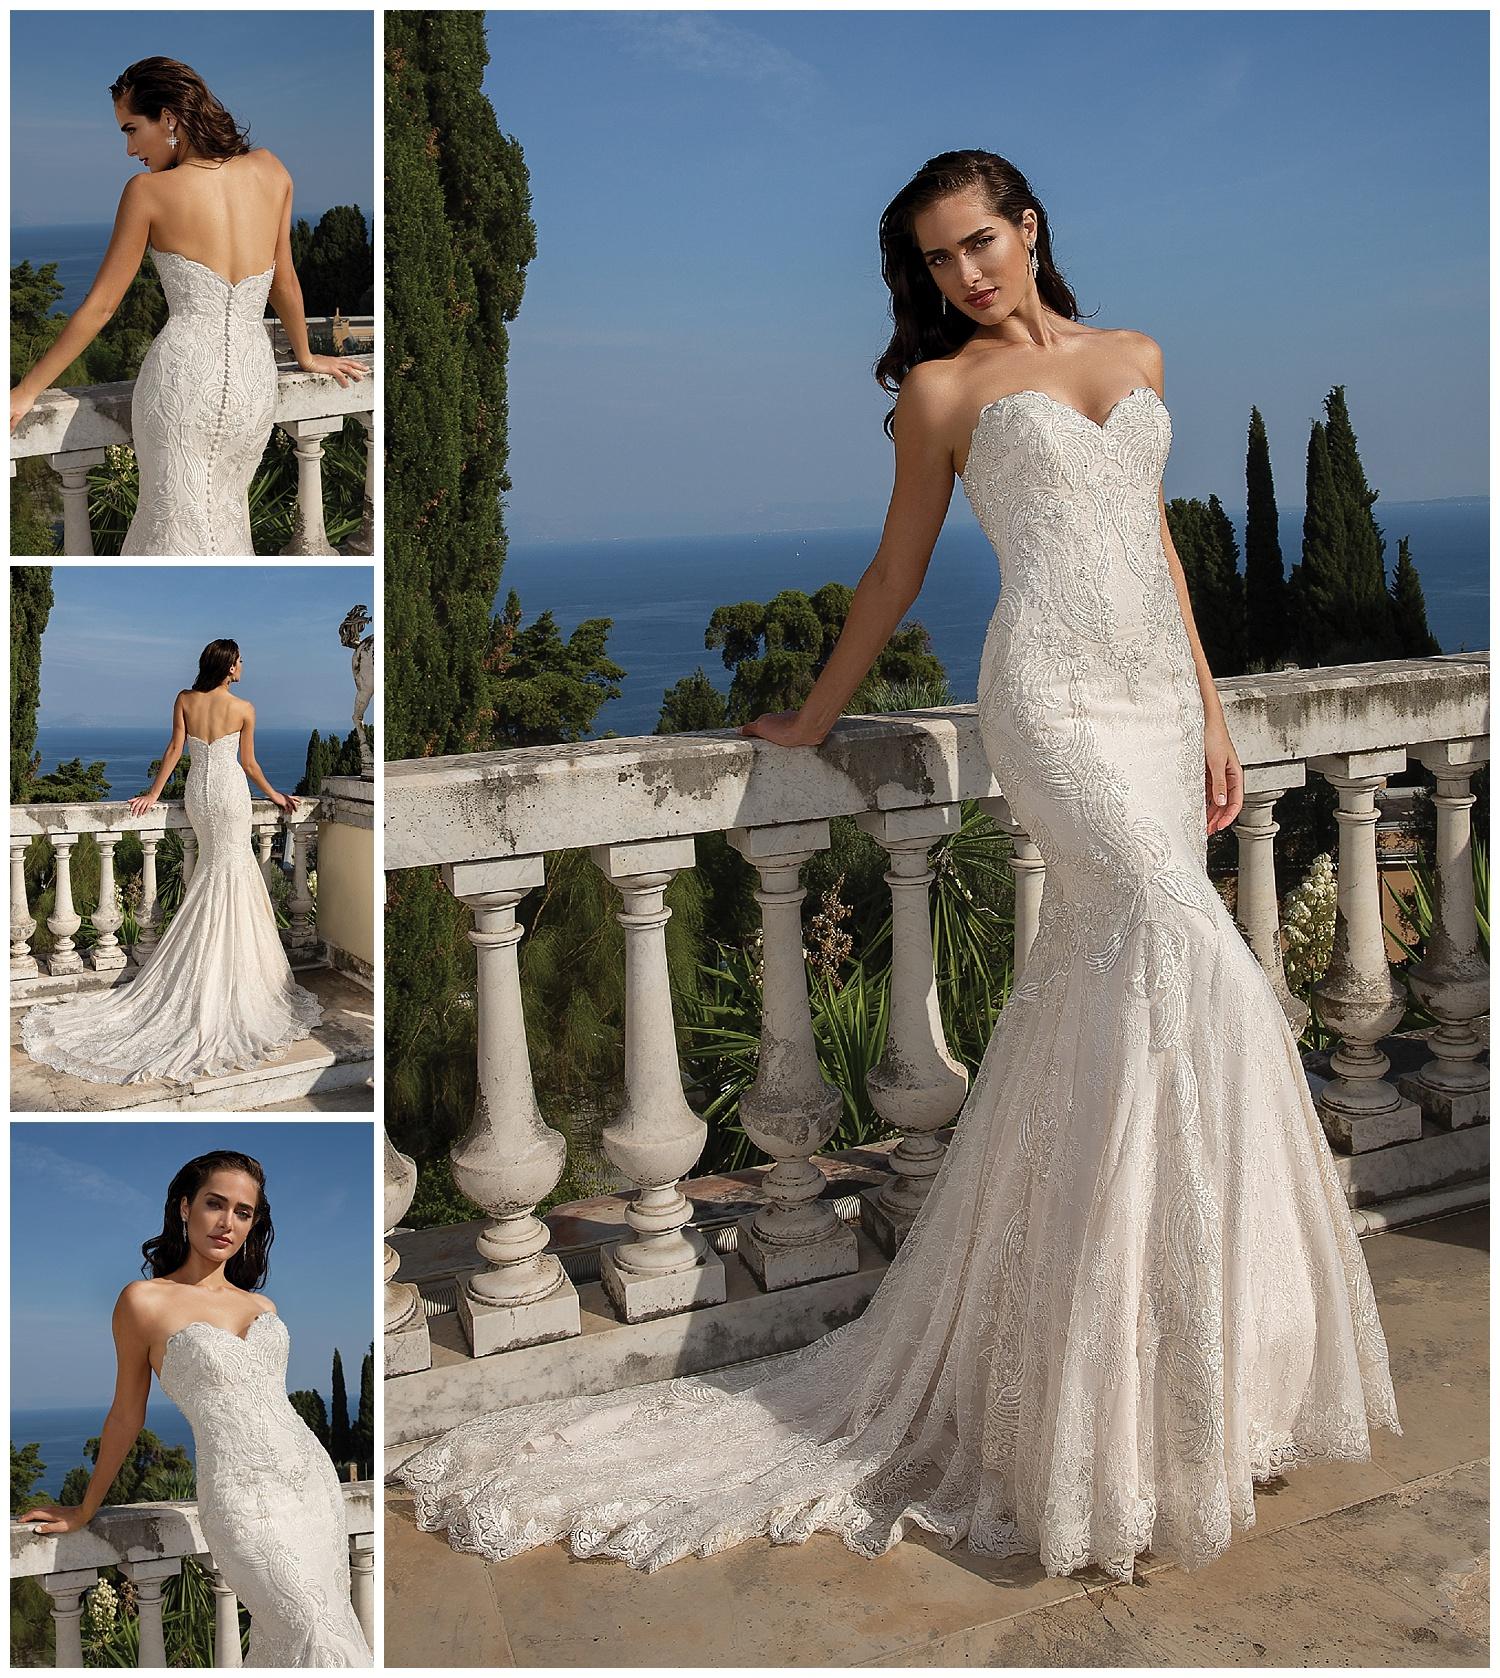 justin-alexander-88101-strapless-lace-wedding-dress-epiphany-boutique-carmel-california.jpg